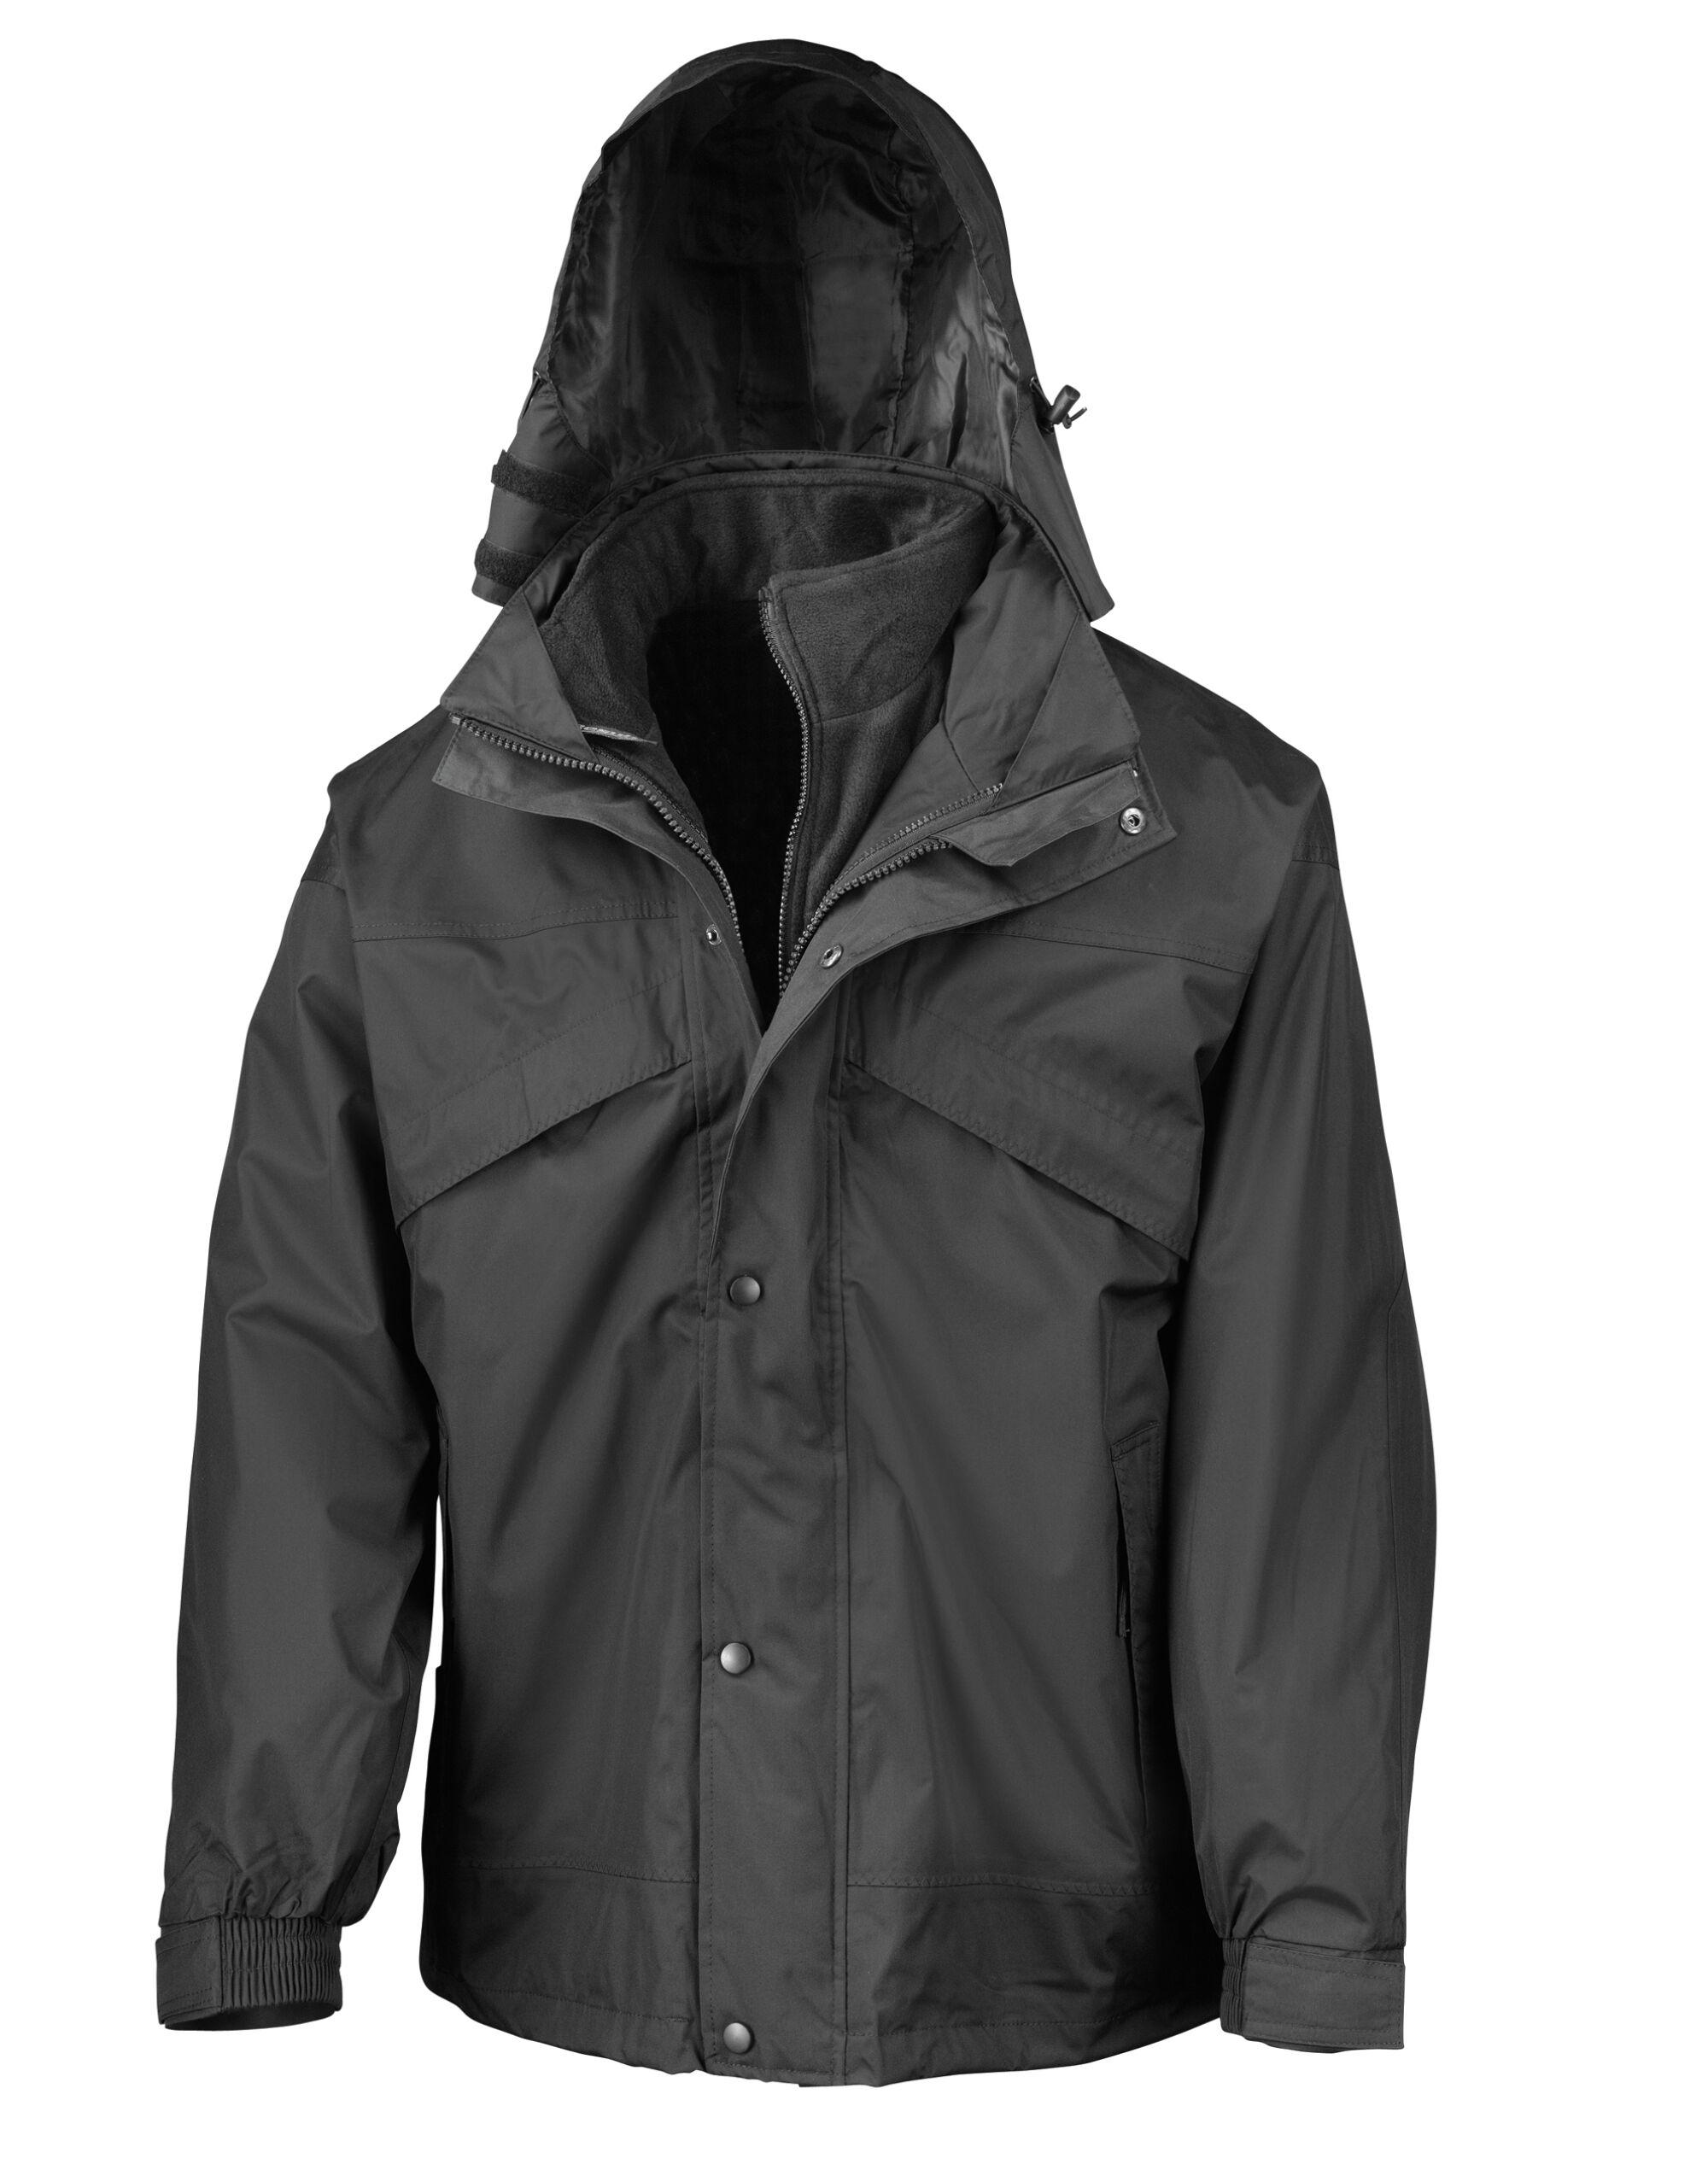 3 in 1 Zip and Clip Jacket